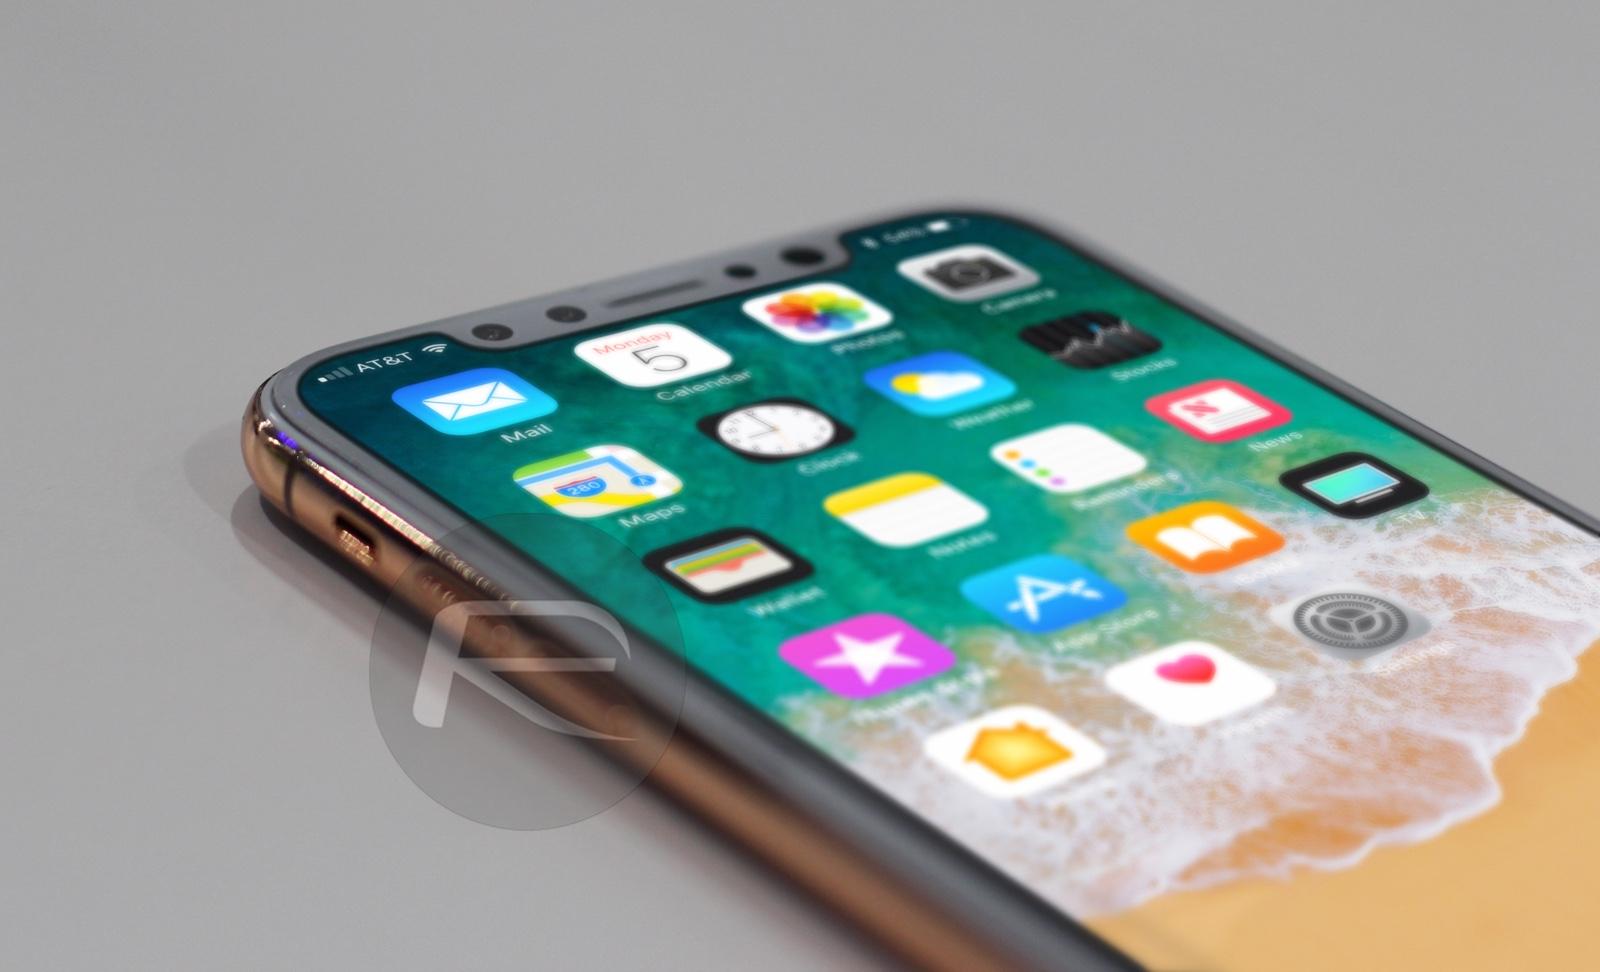 Iphone X Edition Vs Iphone 7 Vs 7 Plus Vs 6s Vs 2g More Screen